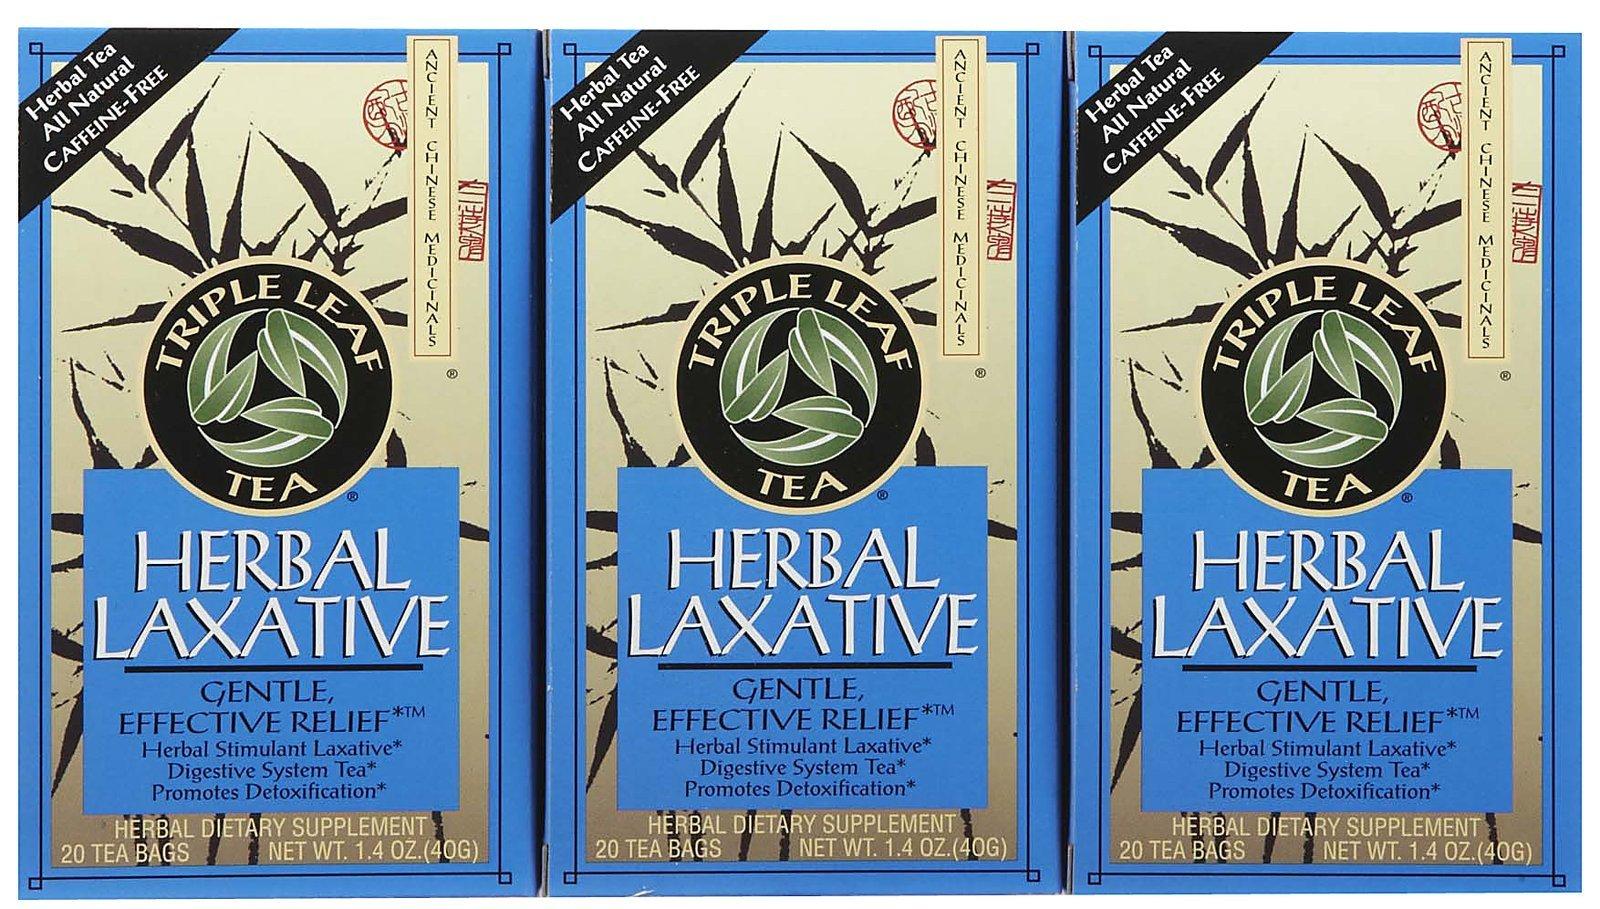 Triple Leaf Tea Herbal Laxative -- 20 Tea Bags